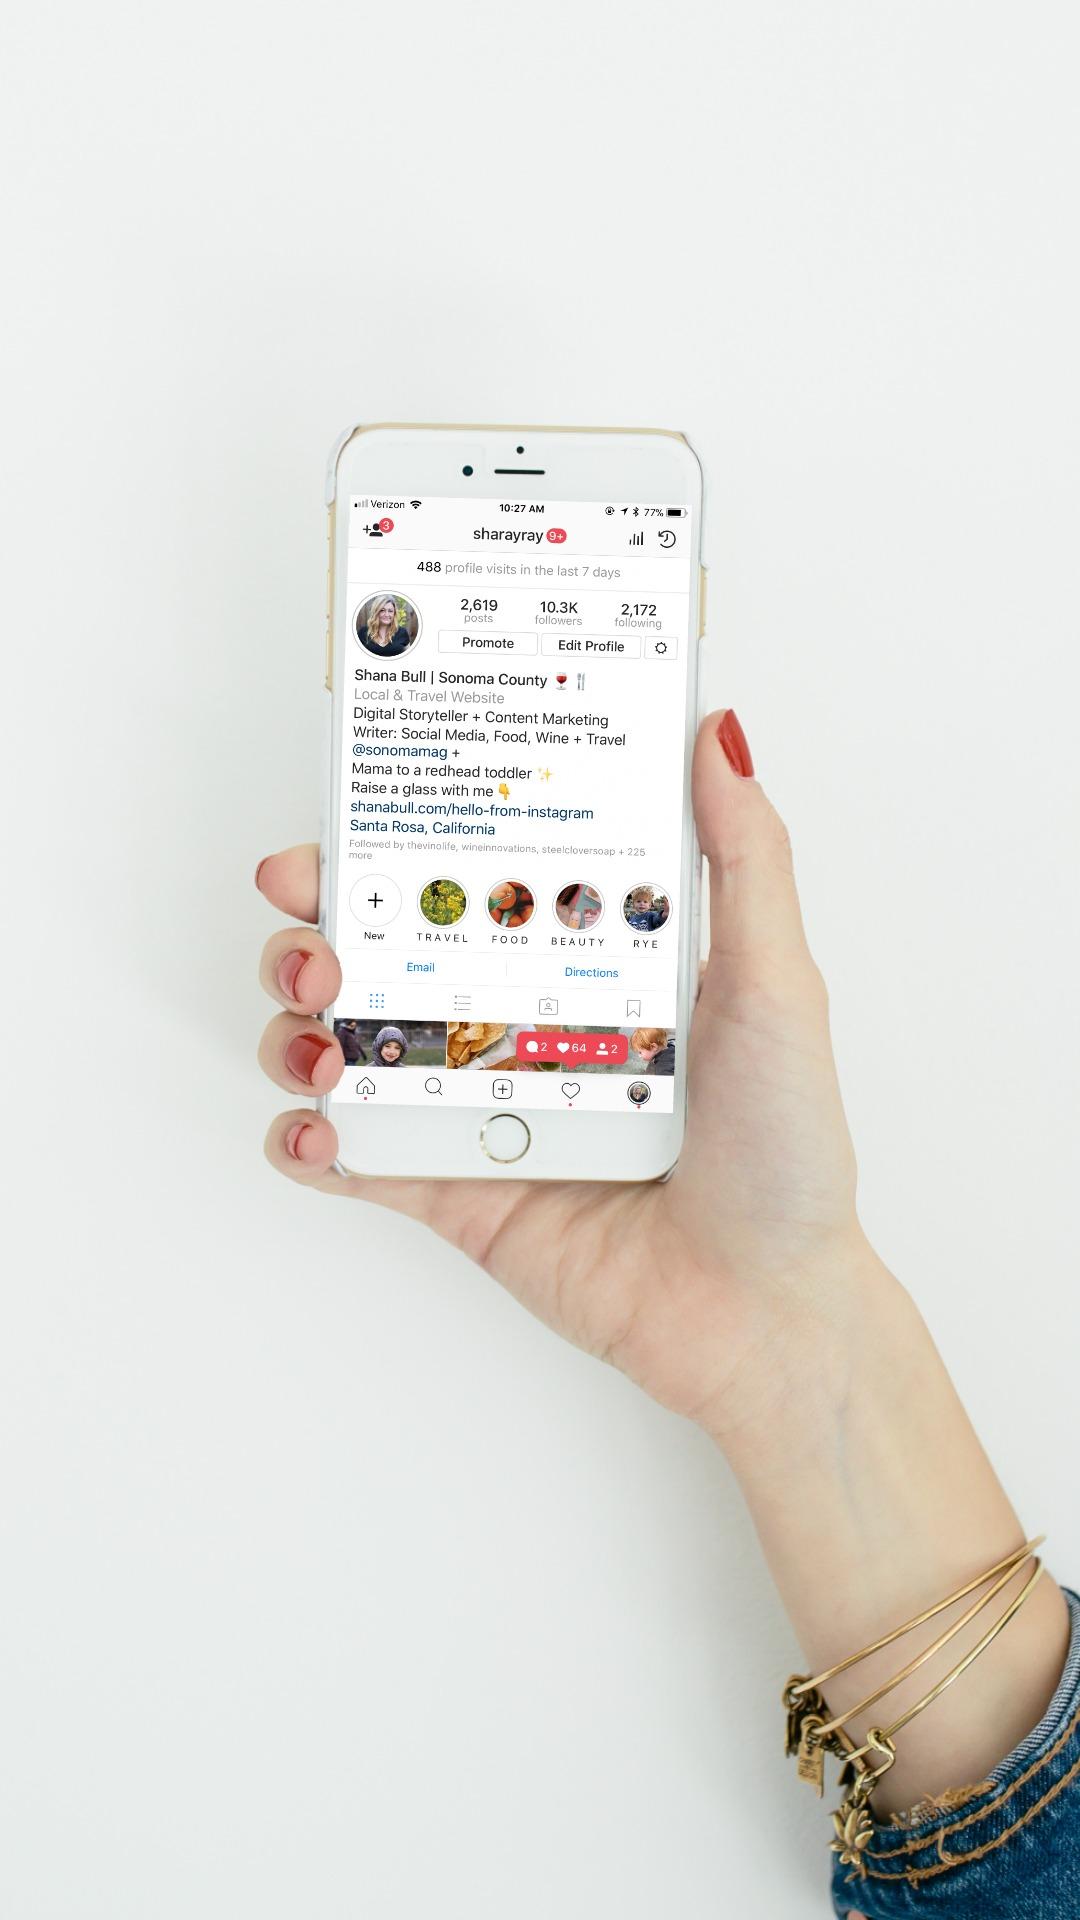 Instagram Marketing with Followers